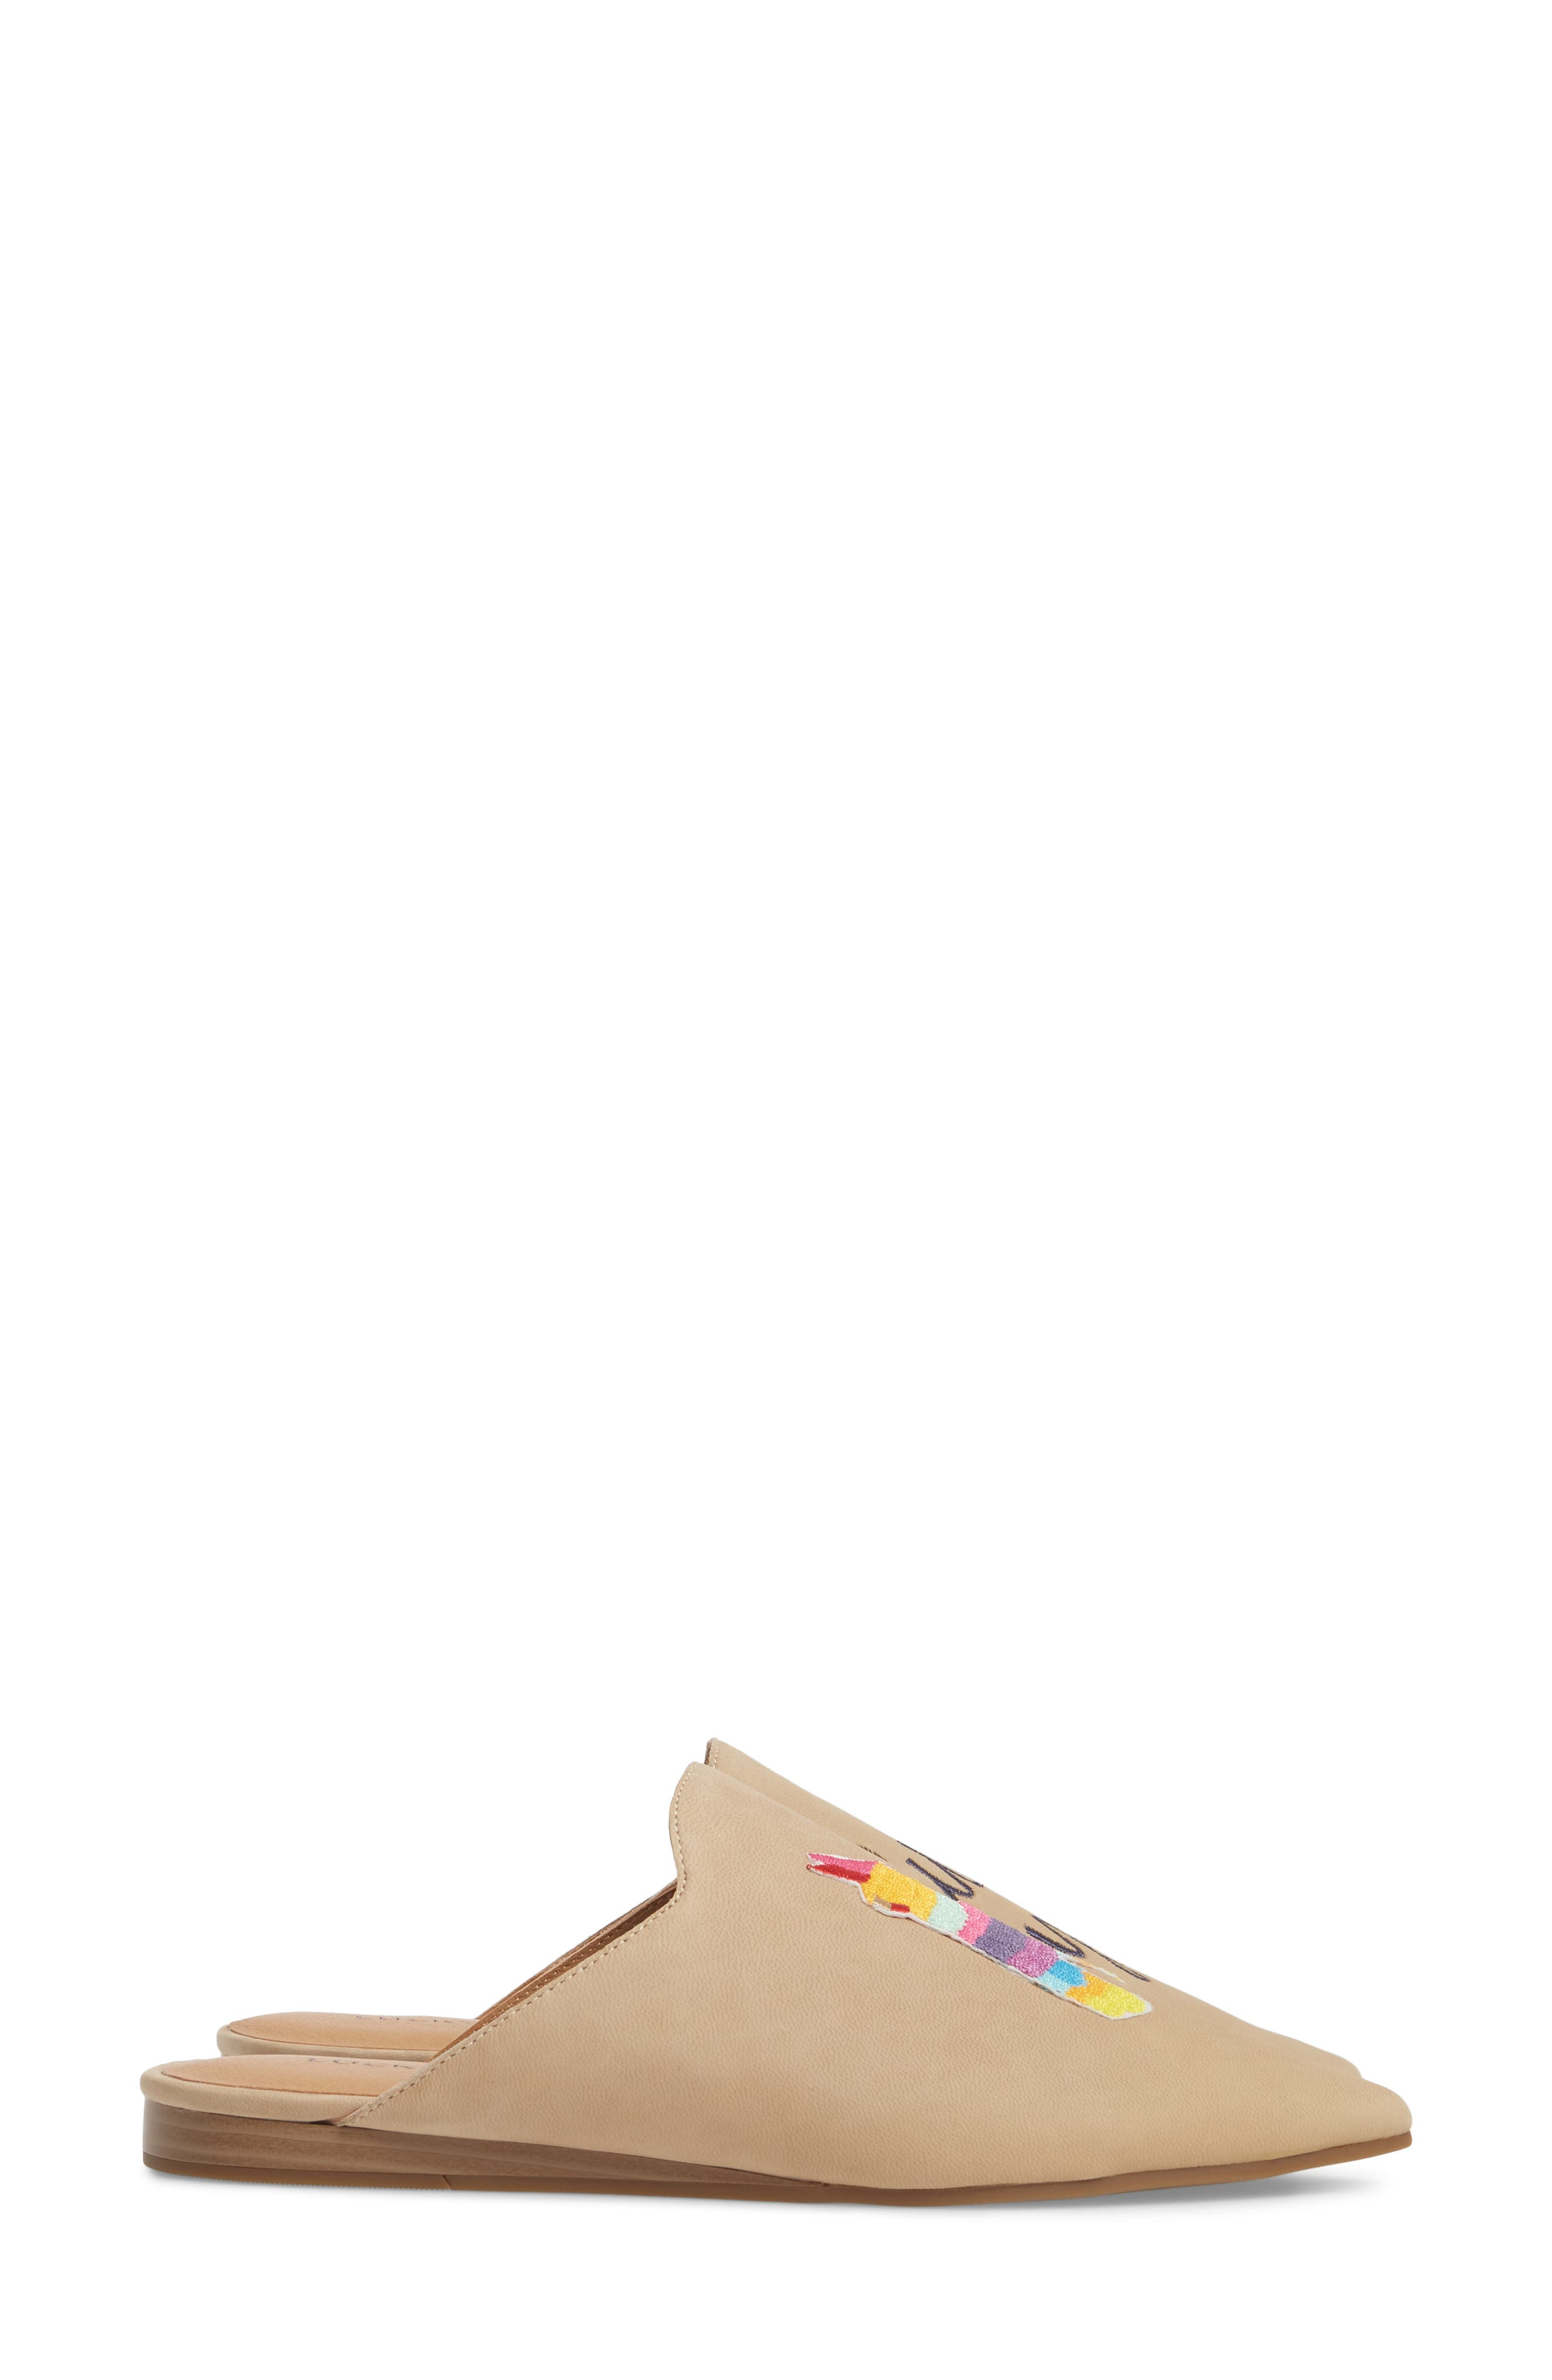 Blythh II Mule,                             Alternate thumbnail 3, color,                             Travertine Nubuck